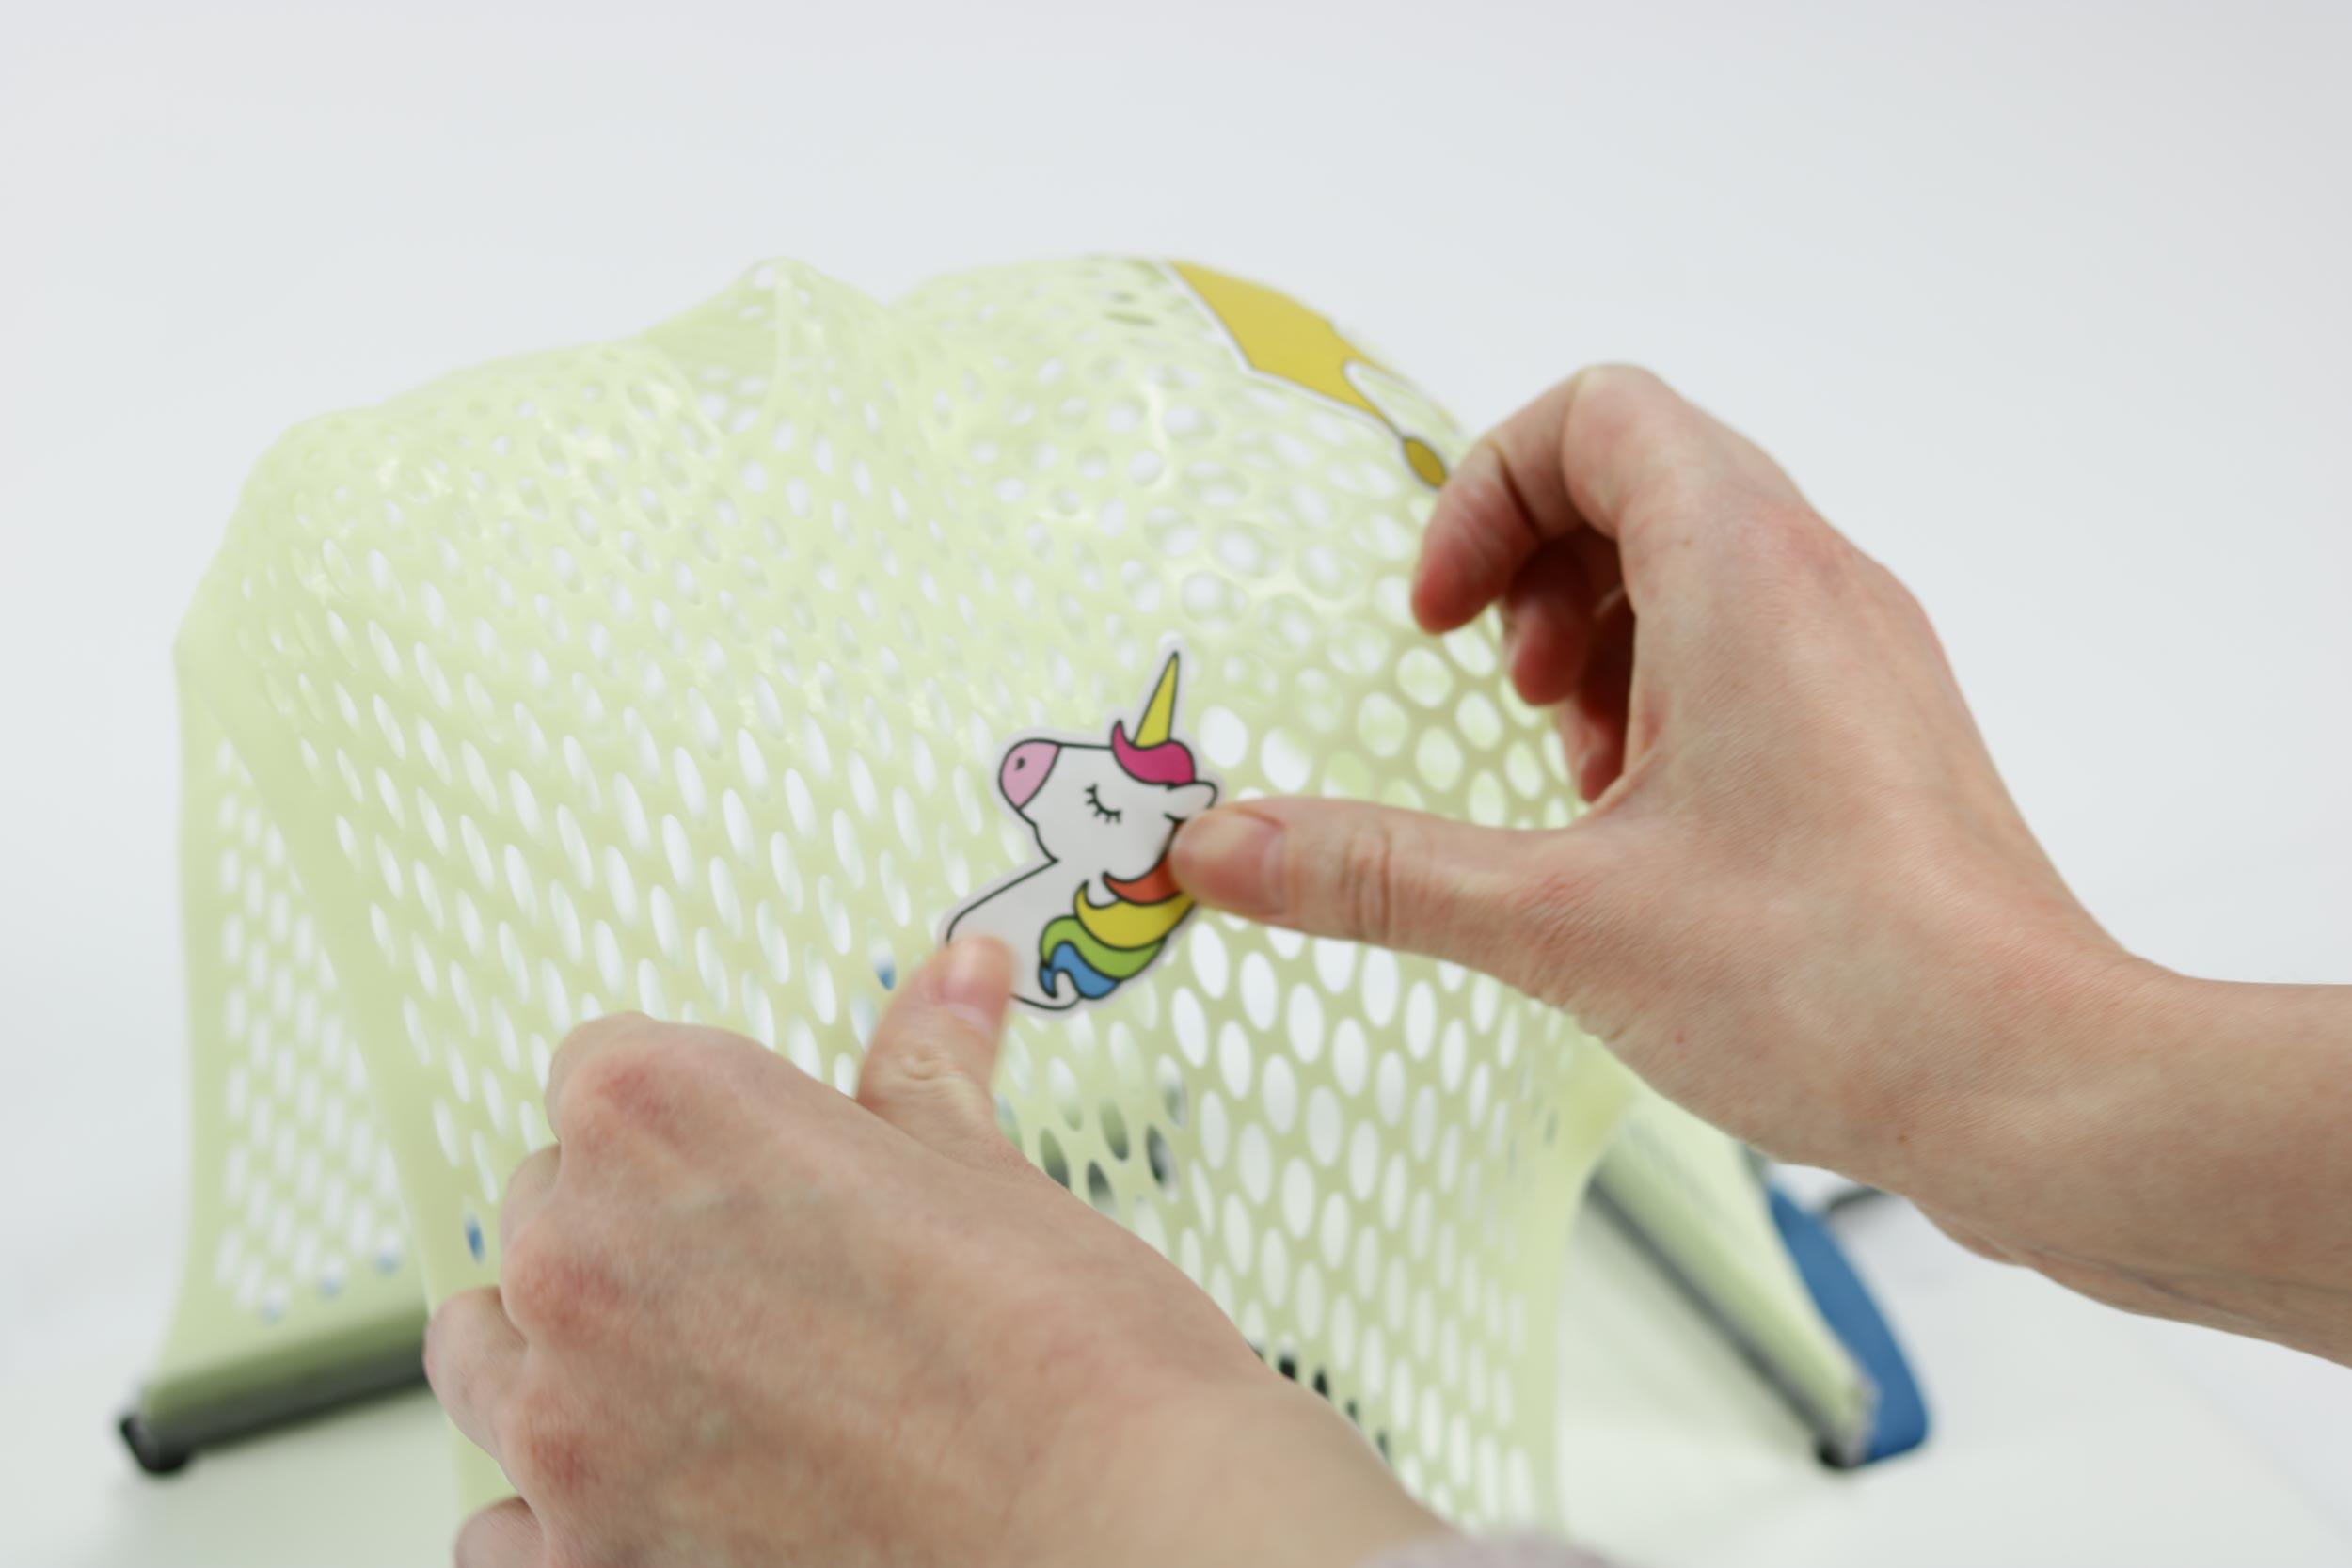 Sticking a unicorn sticker on a thermoplastic mask